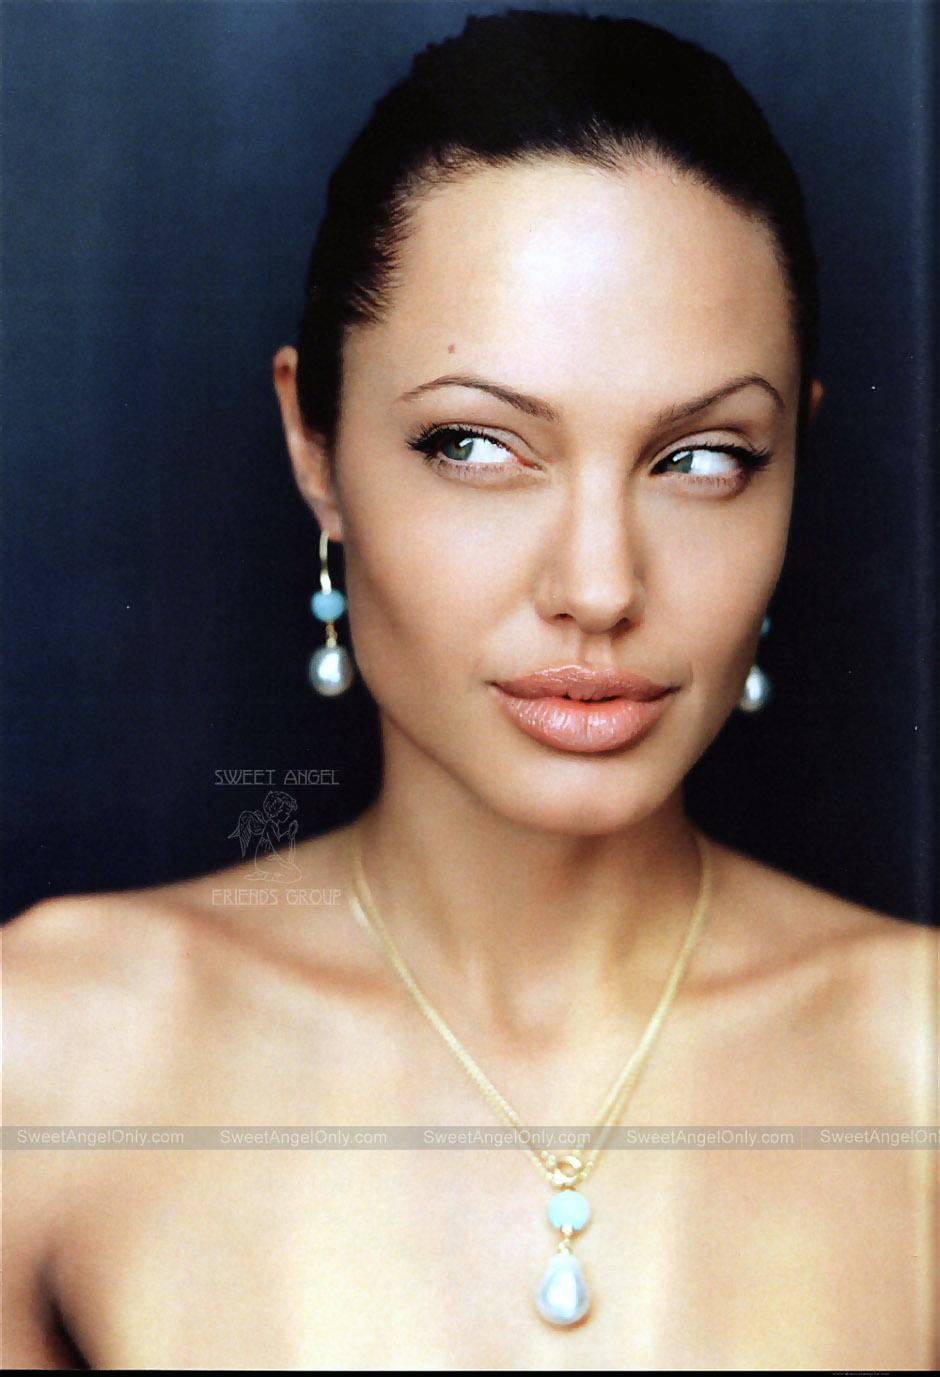 Angelina Jolie Look Using All Drugstore Makeup: Hot Wallpapers-Angelina Jolie-02